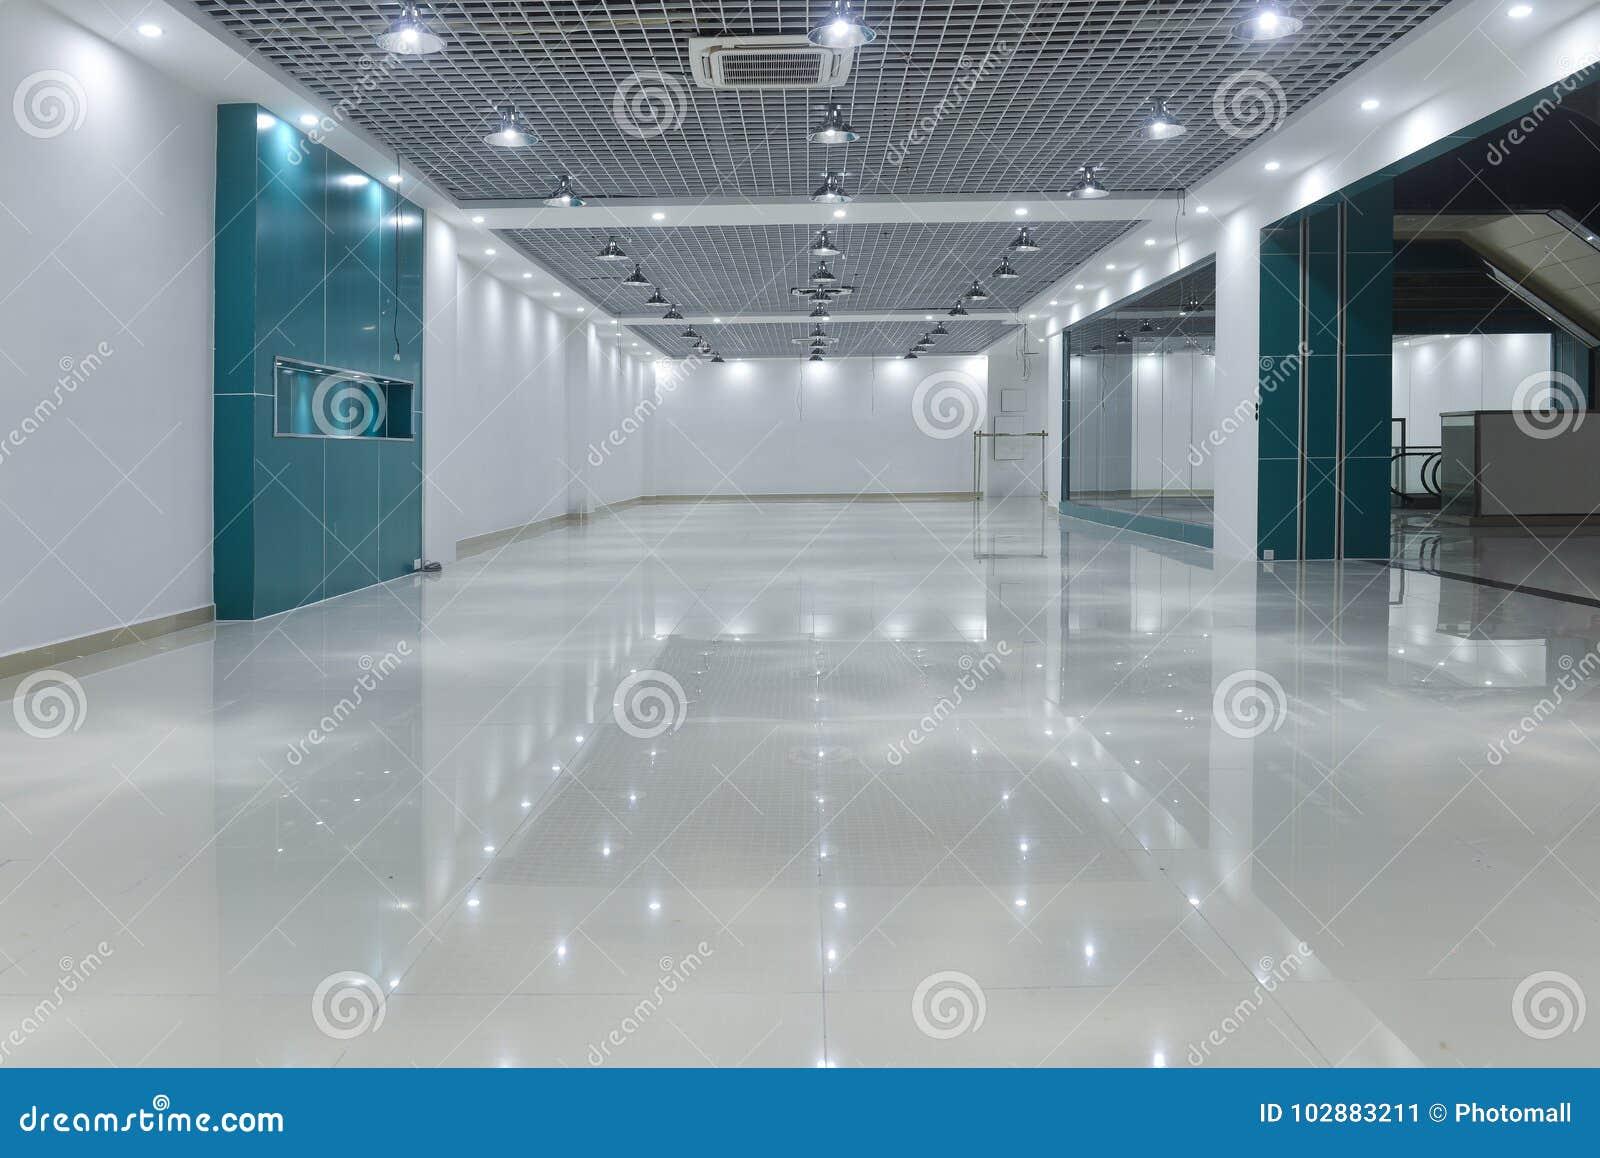 Leerer Raum im modernen Handelsgebäude